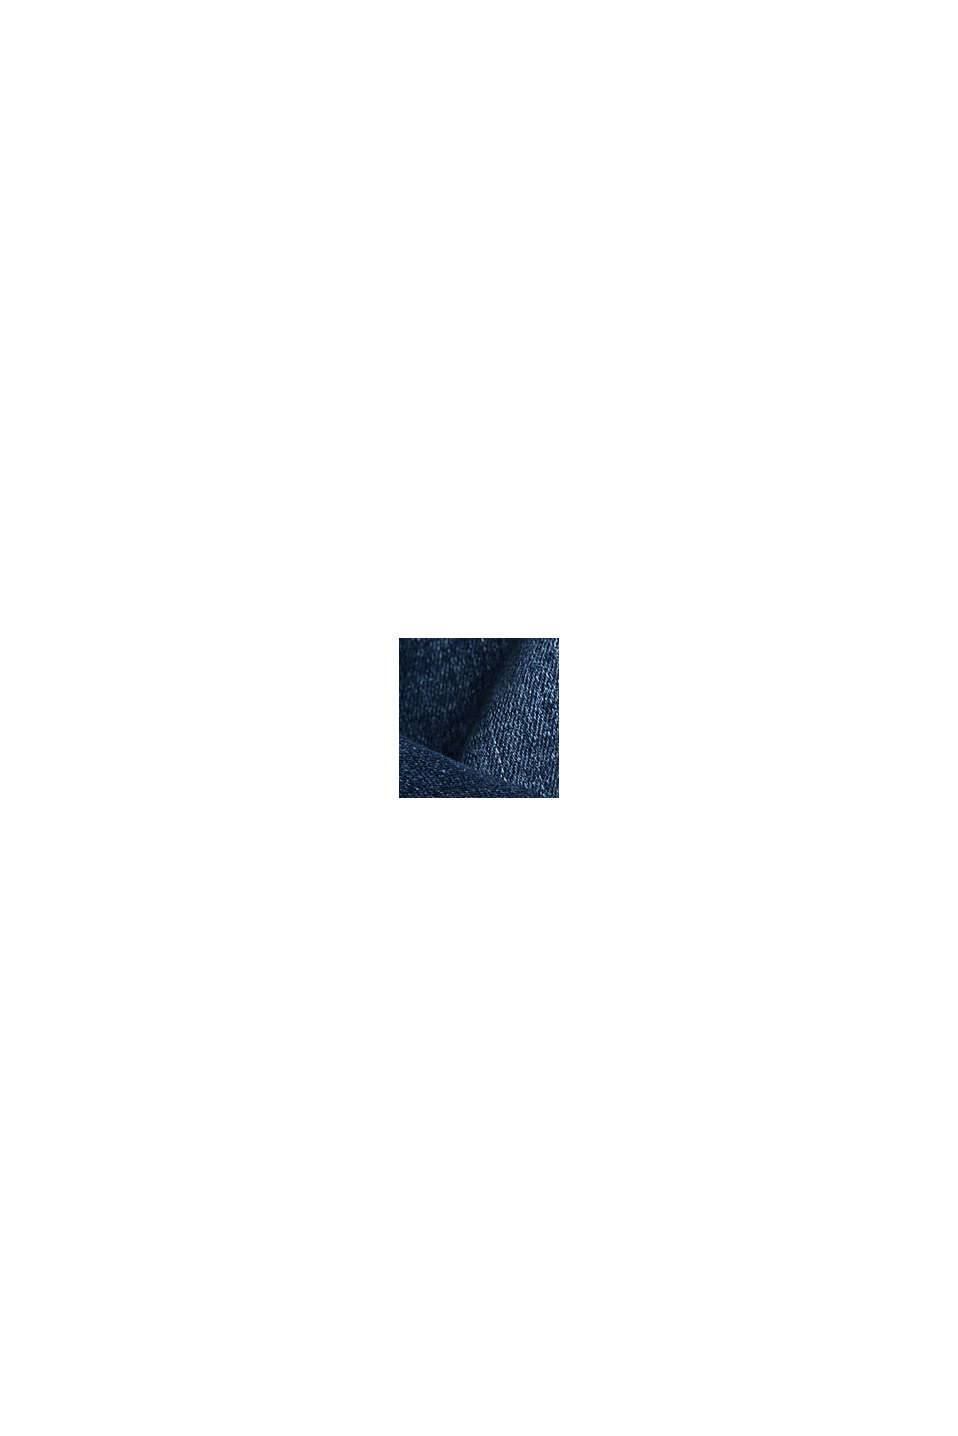 Stretchjeans met biologisch katoen, BLUE DARK WASHED, swatch